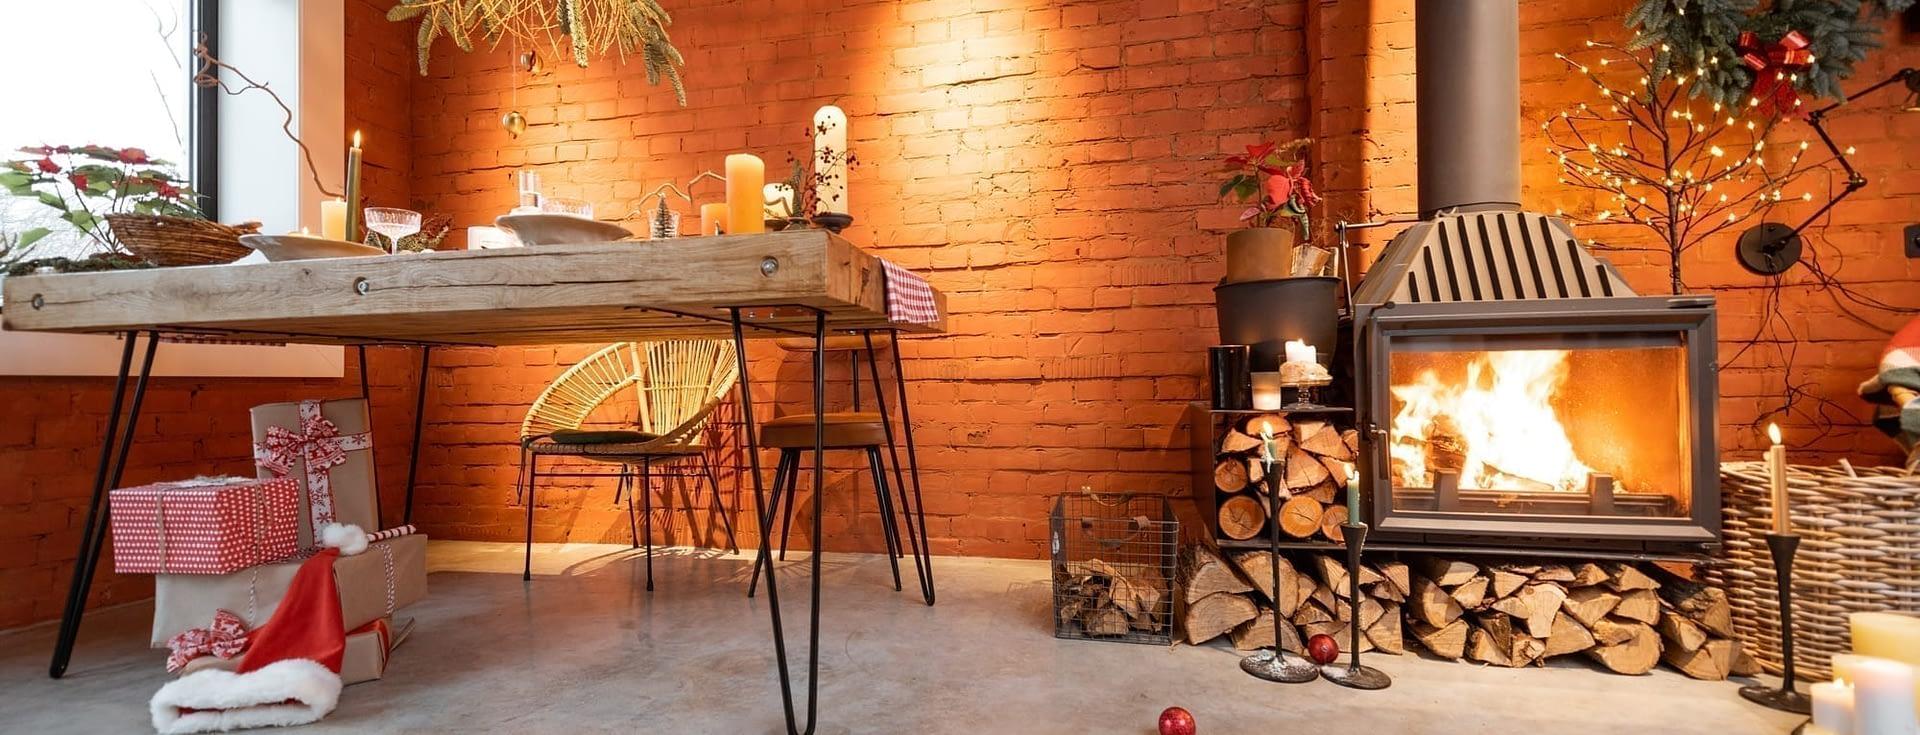 Premium hardwood firewood in stock